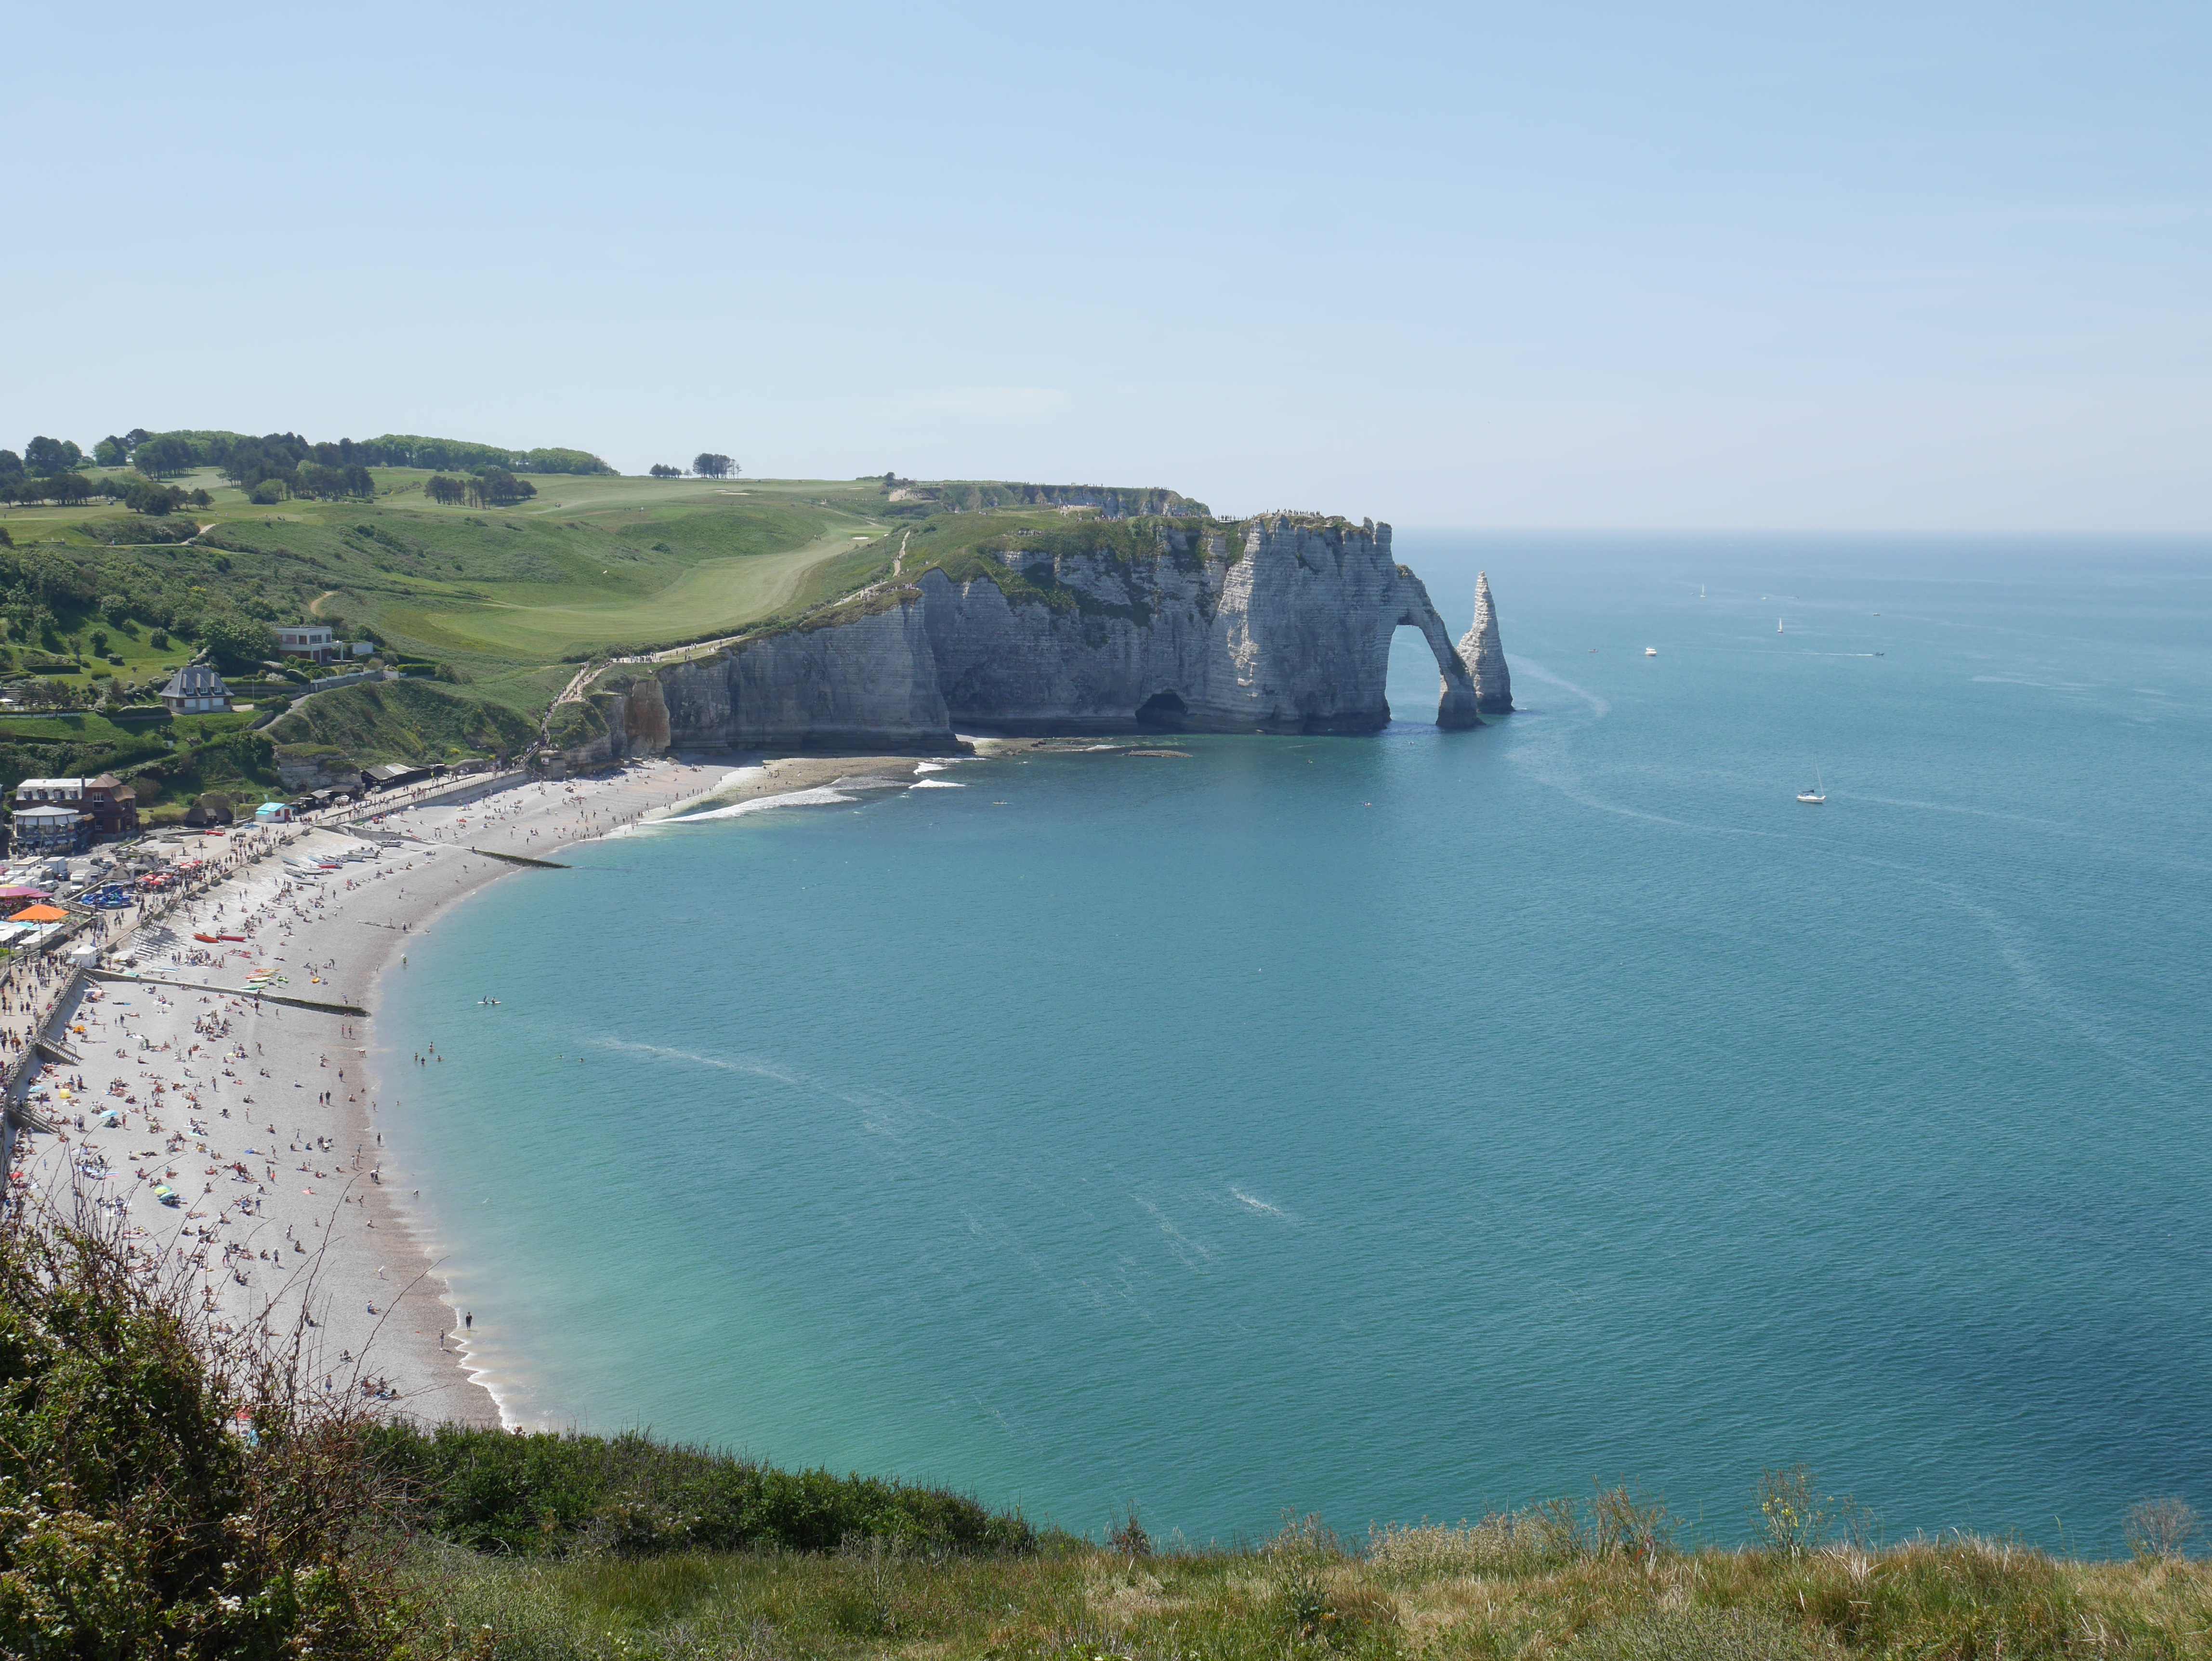 Normandy Etretat